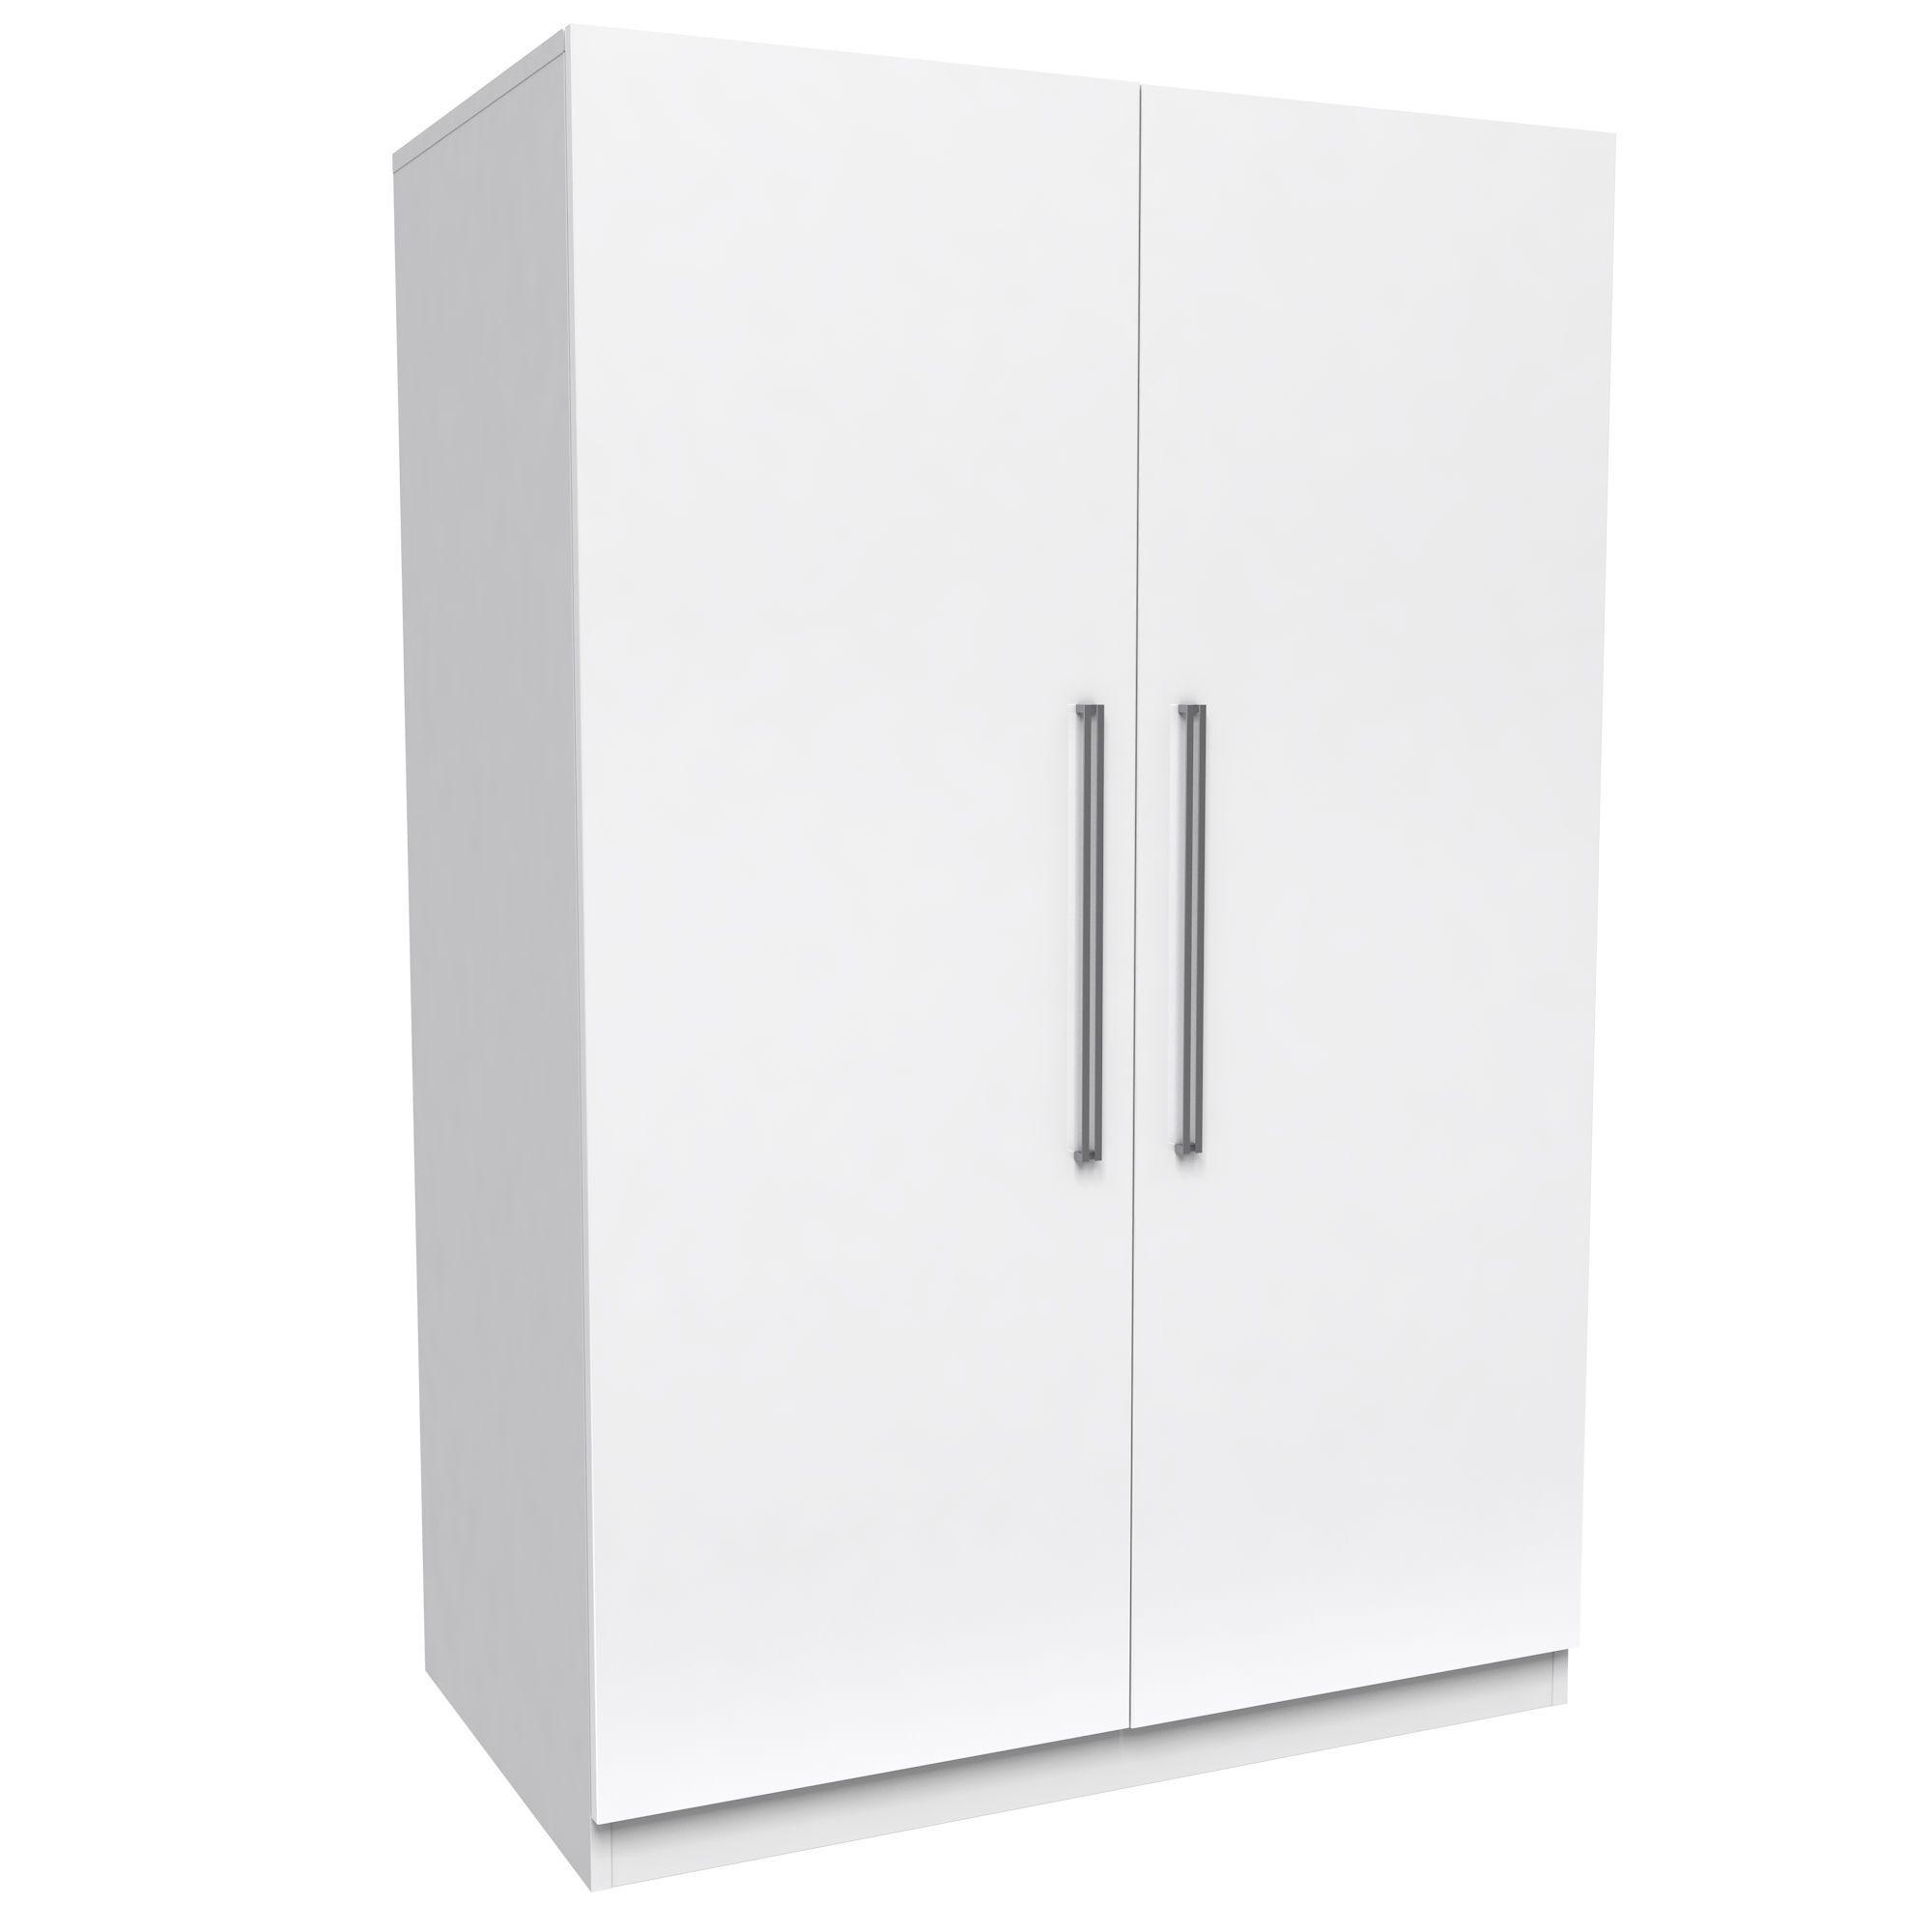 Darwin White 2 Door Wardrobe (h)1506mm (w)998mm